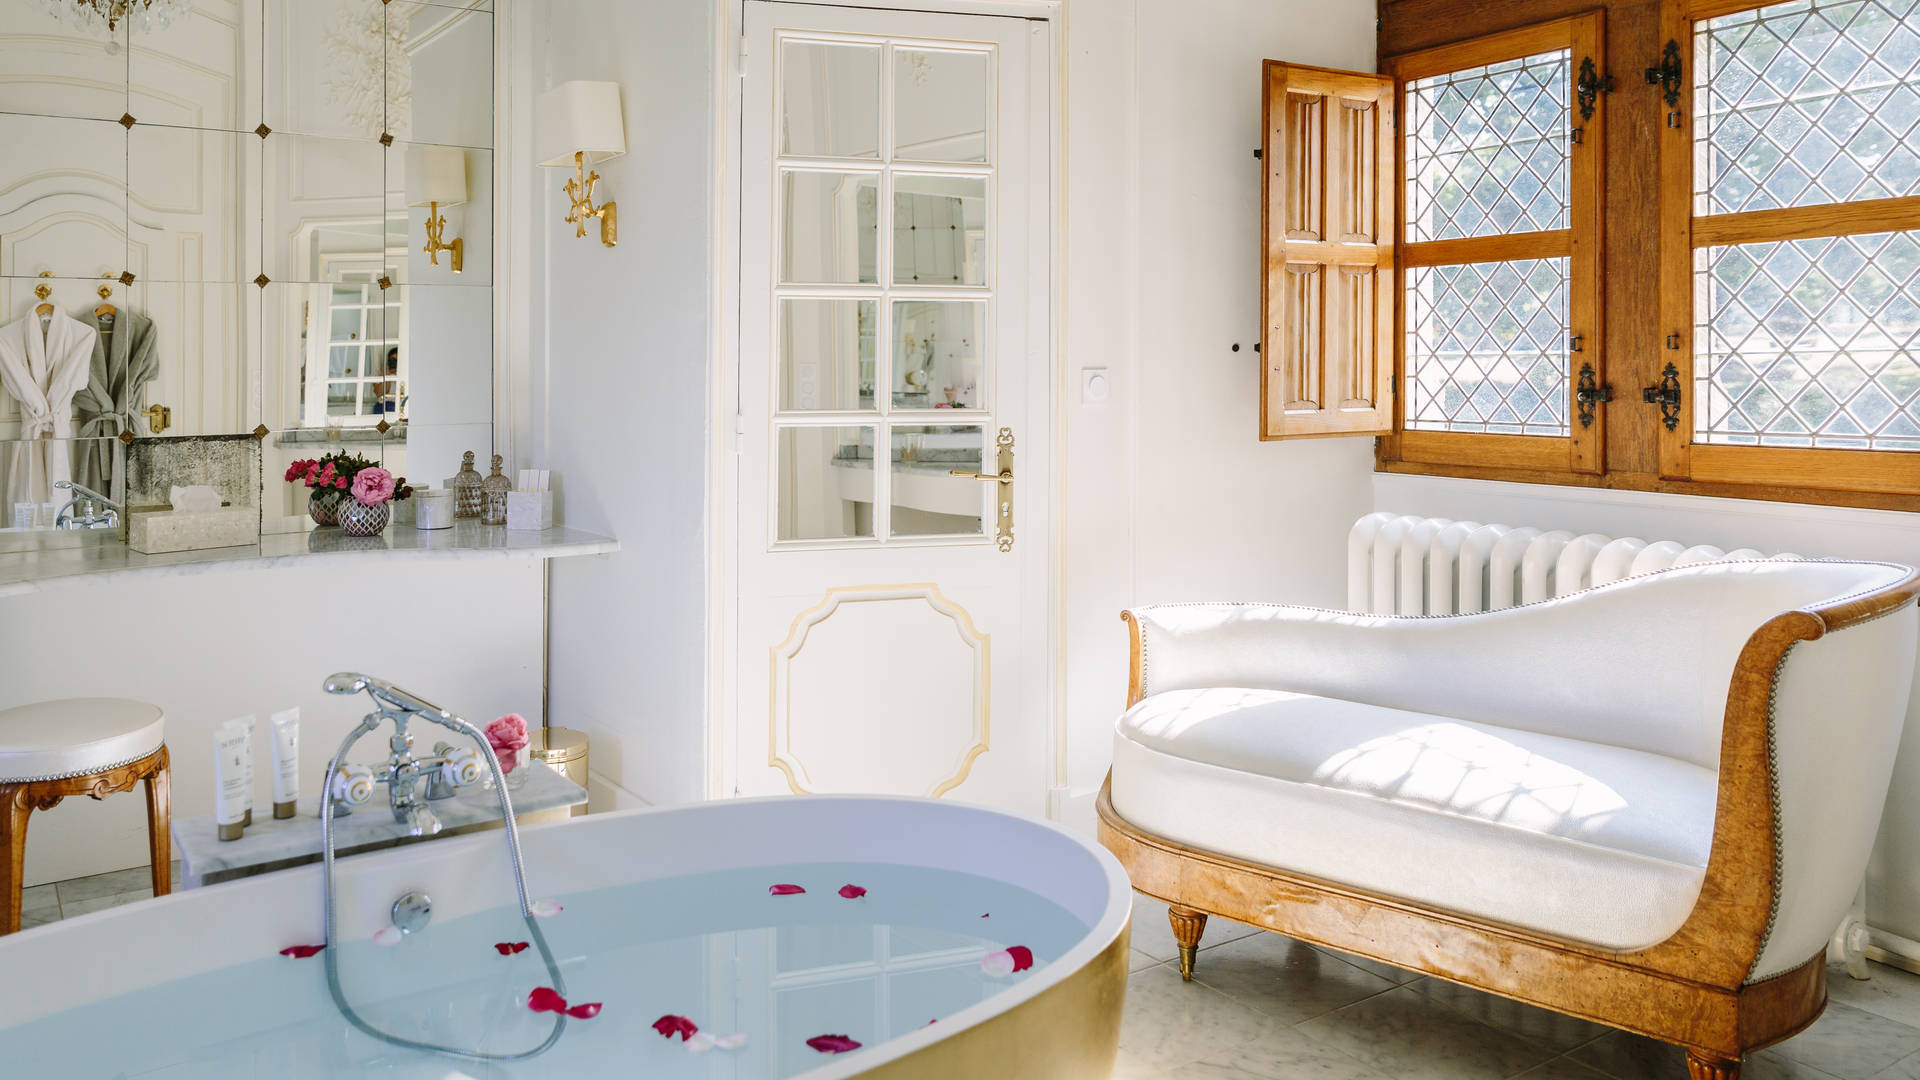 Separation Salon Chambre Studio dordogne hotel in france, château de la treyne: rooms